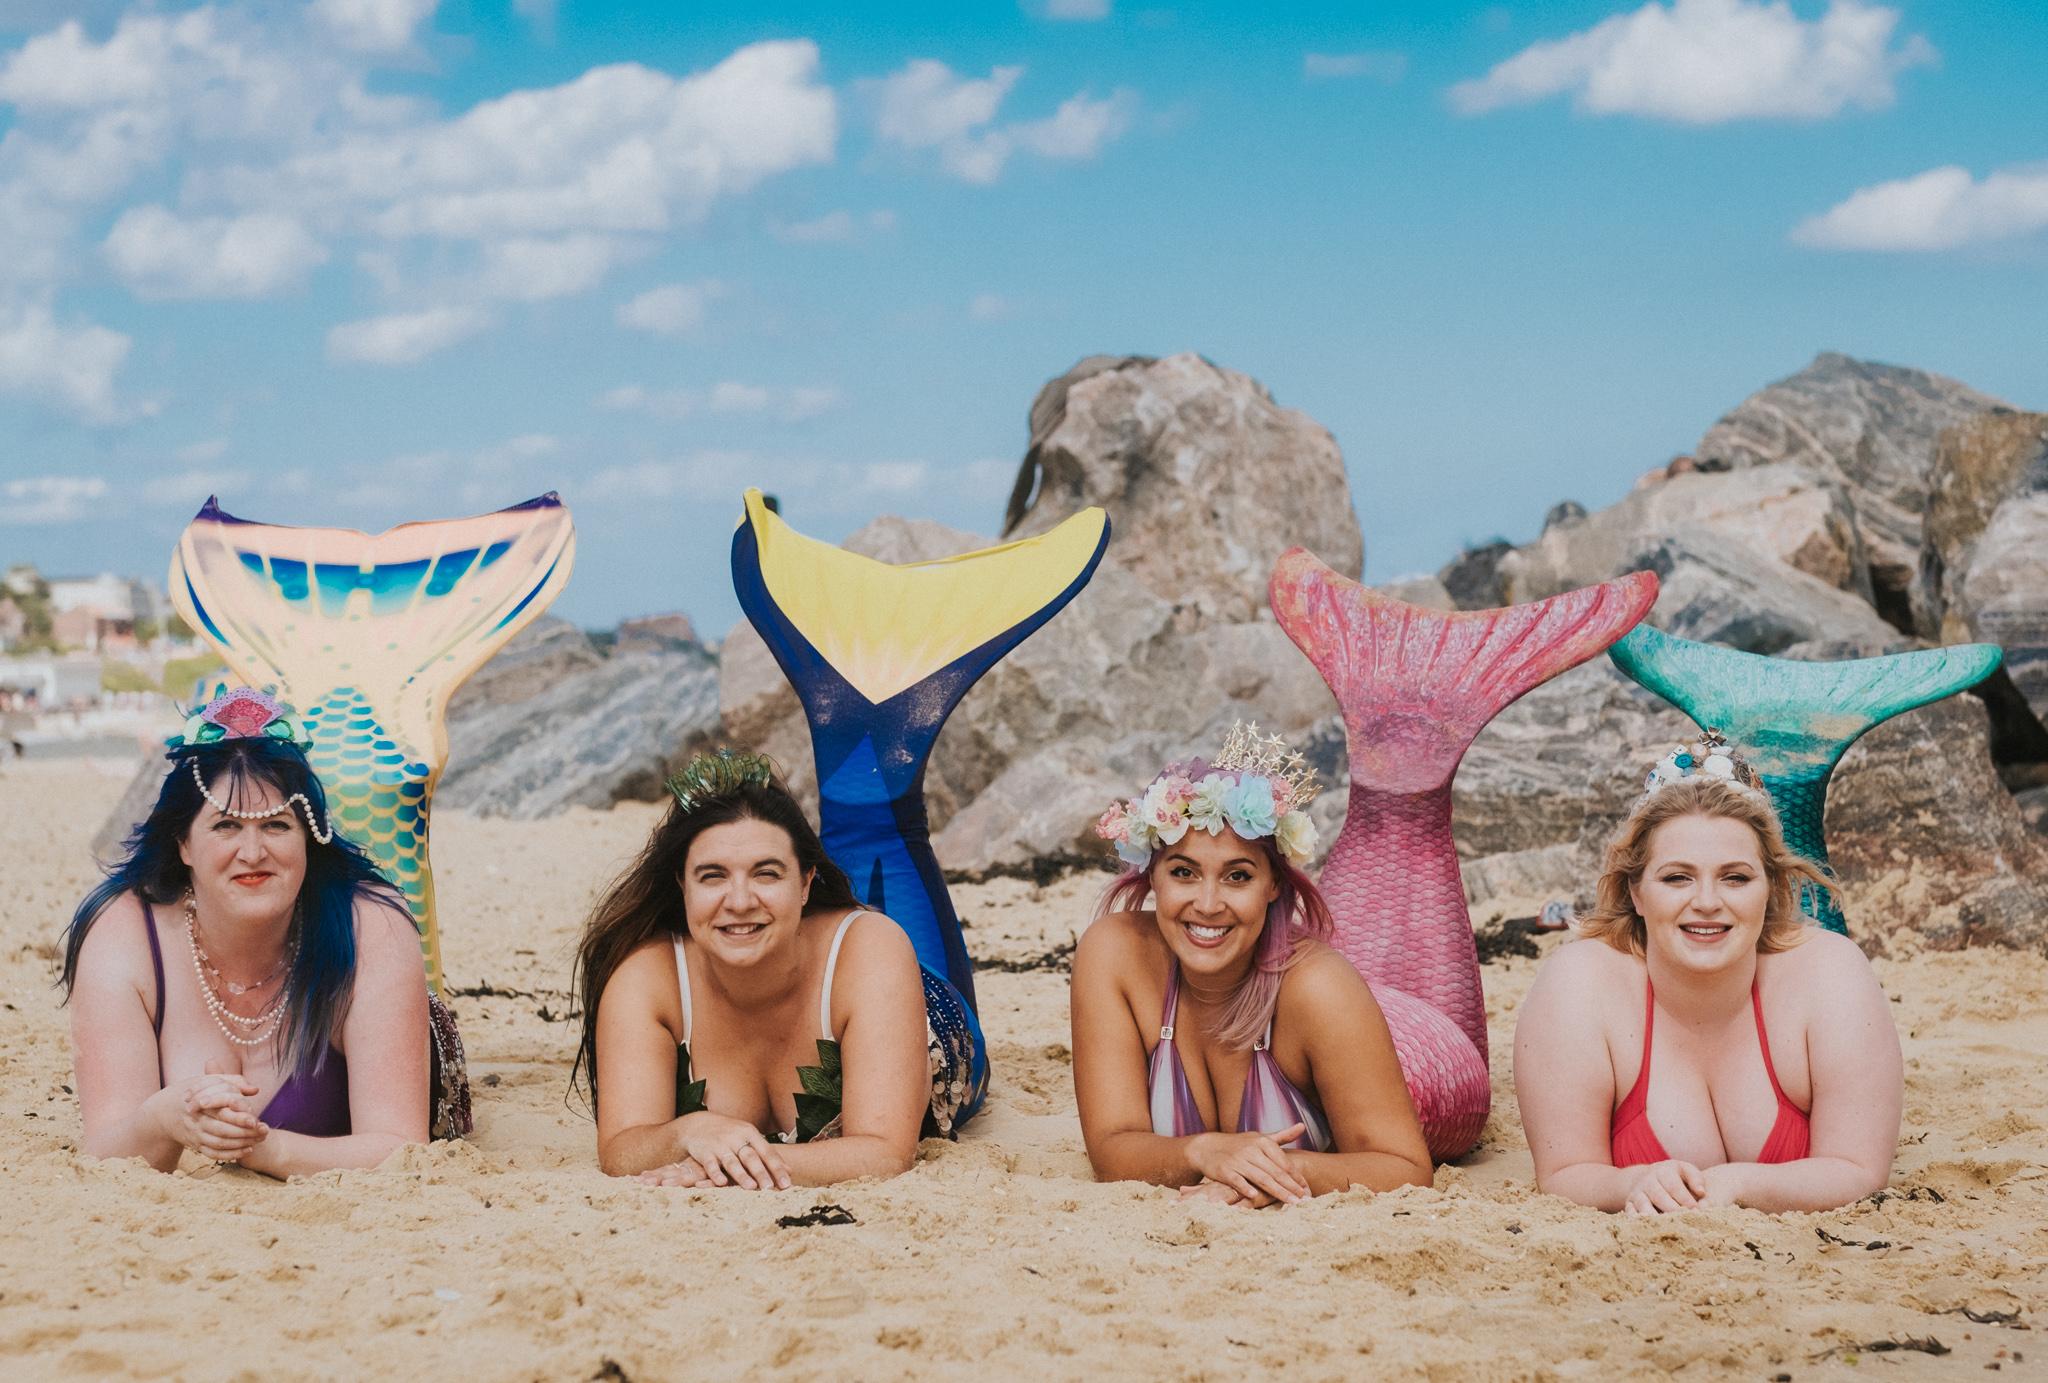 Body-Positive-Mermaids-Grace-Elizabeth-Mermaiding-UK-Alternative-Wedding-Photographer-Colchester-Essex-Suffolk-Norfolk-Devon (4 of 59).jpg